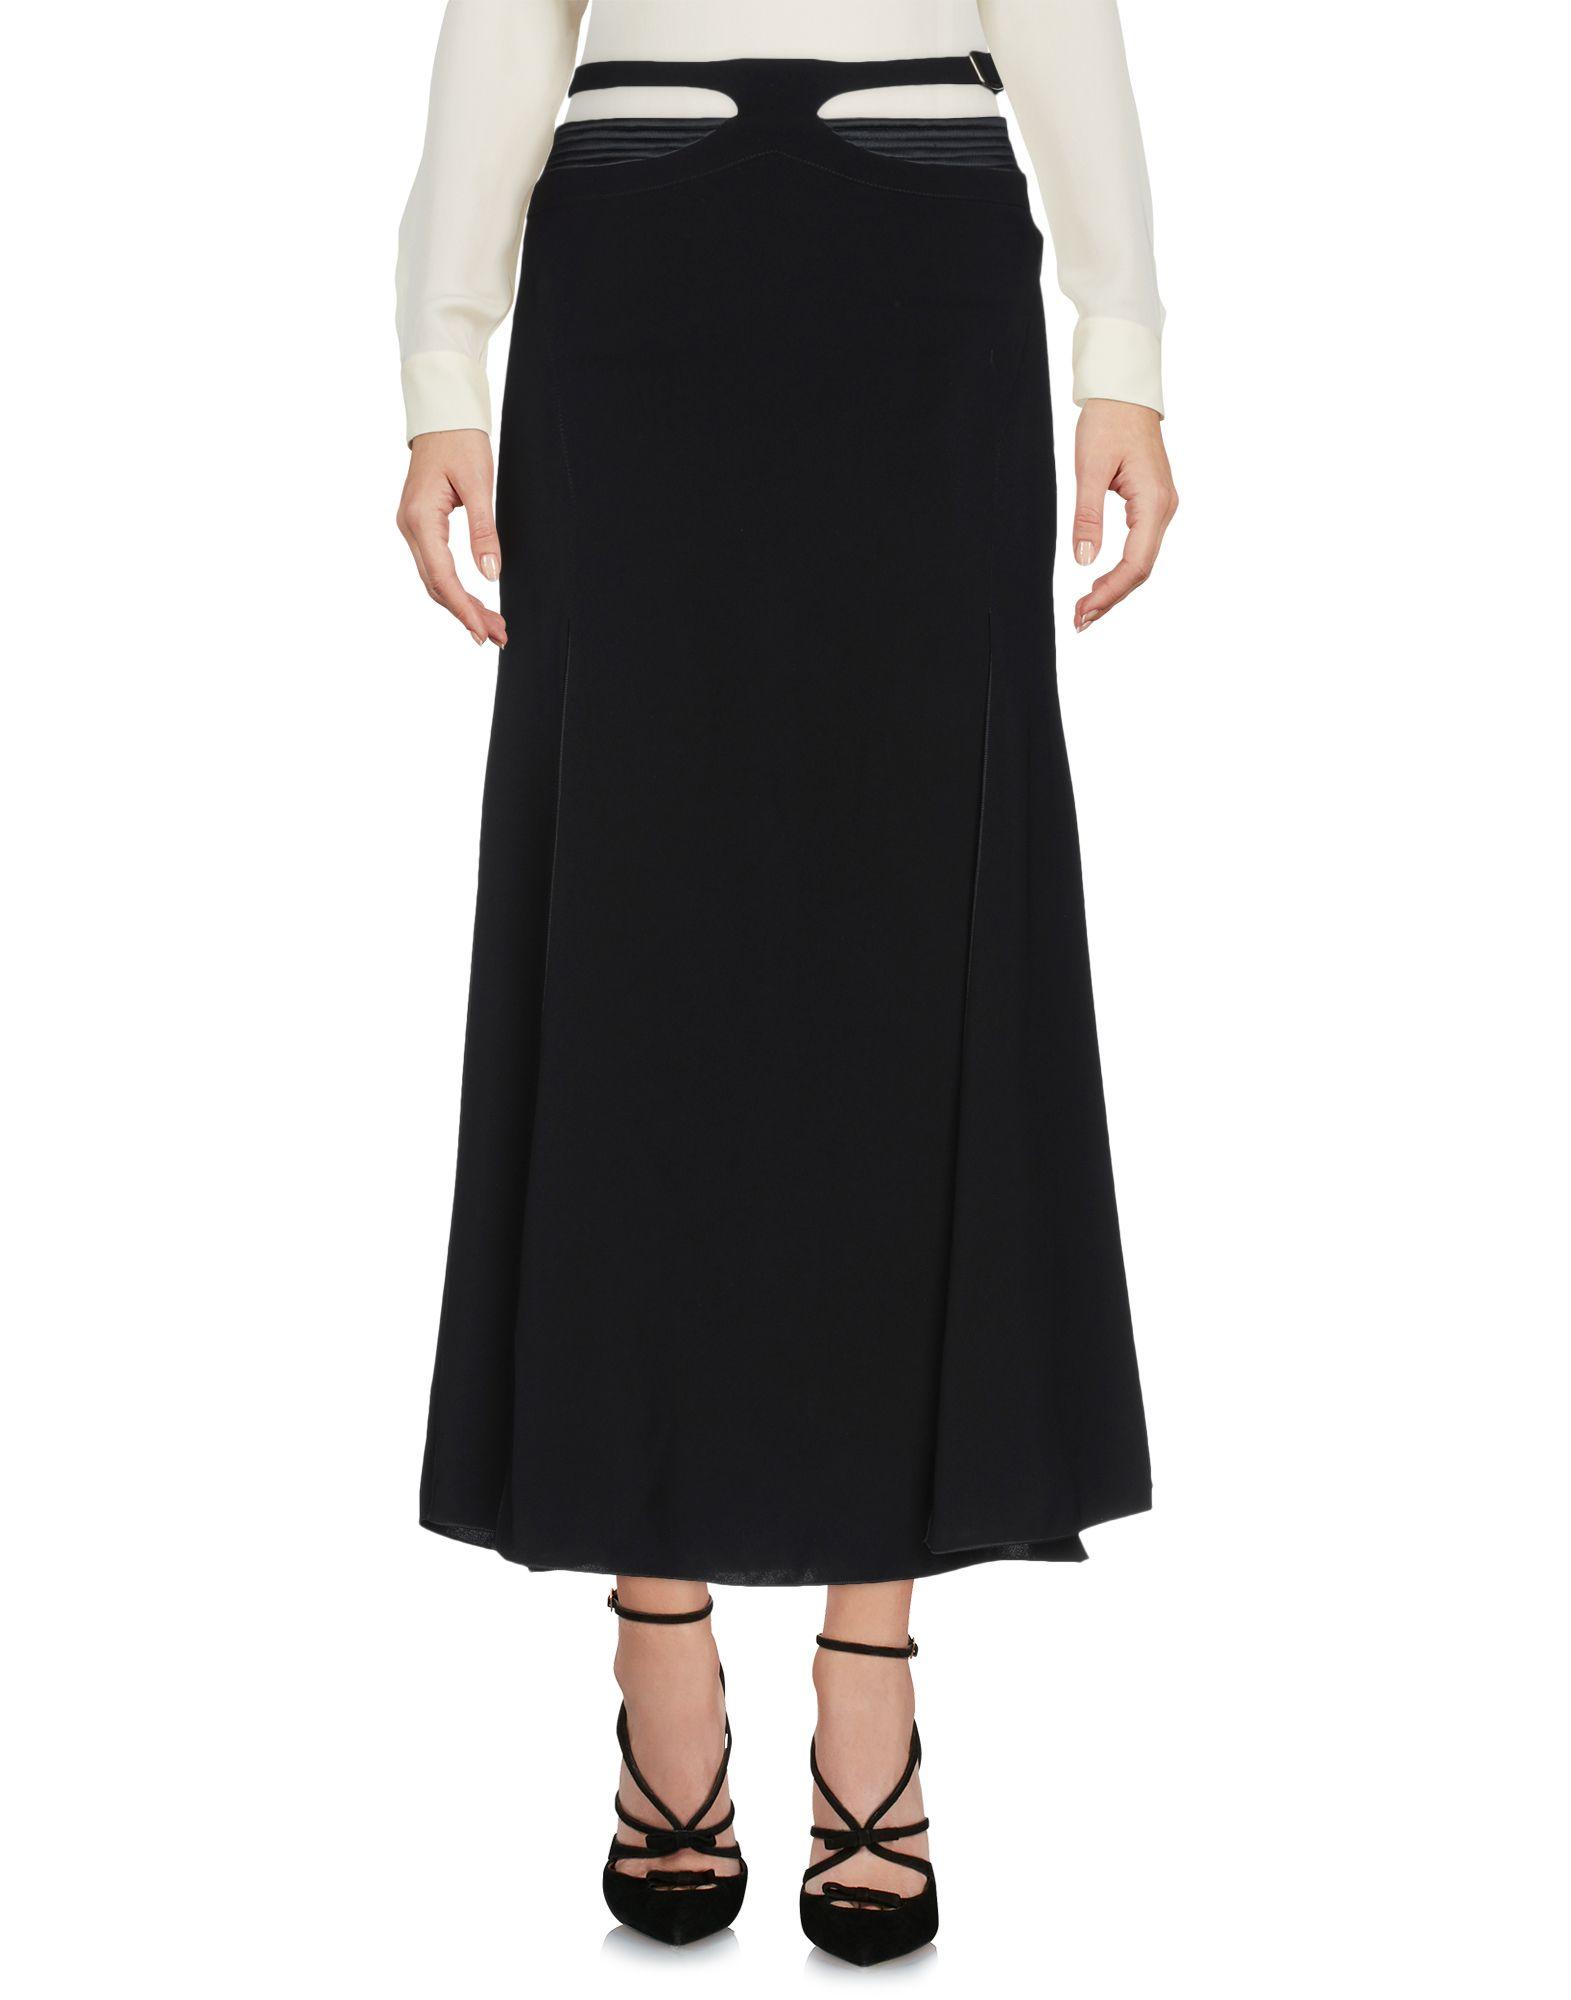 VERSACE JEANS COUTURE Юбка длиной 3/4 moschino couture юбка длиной 3 4